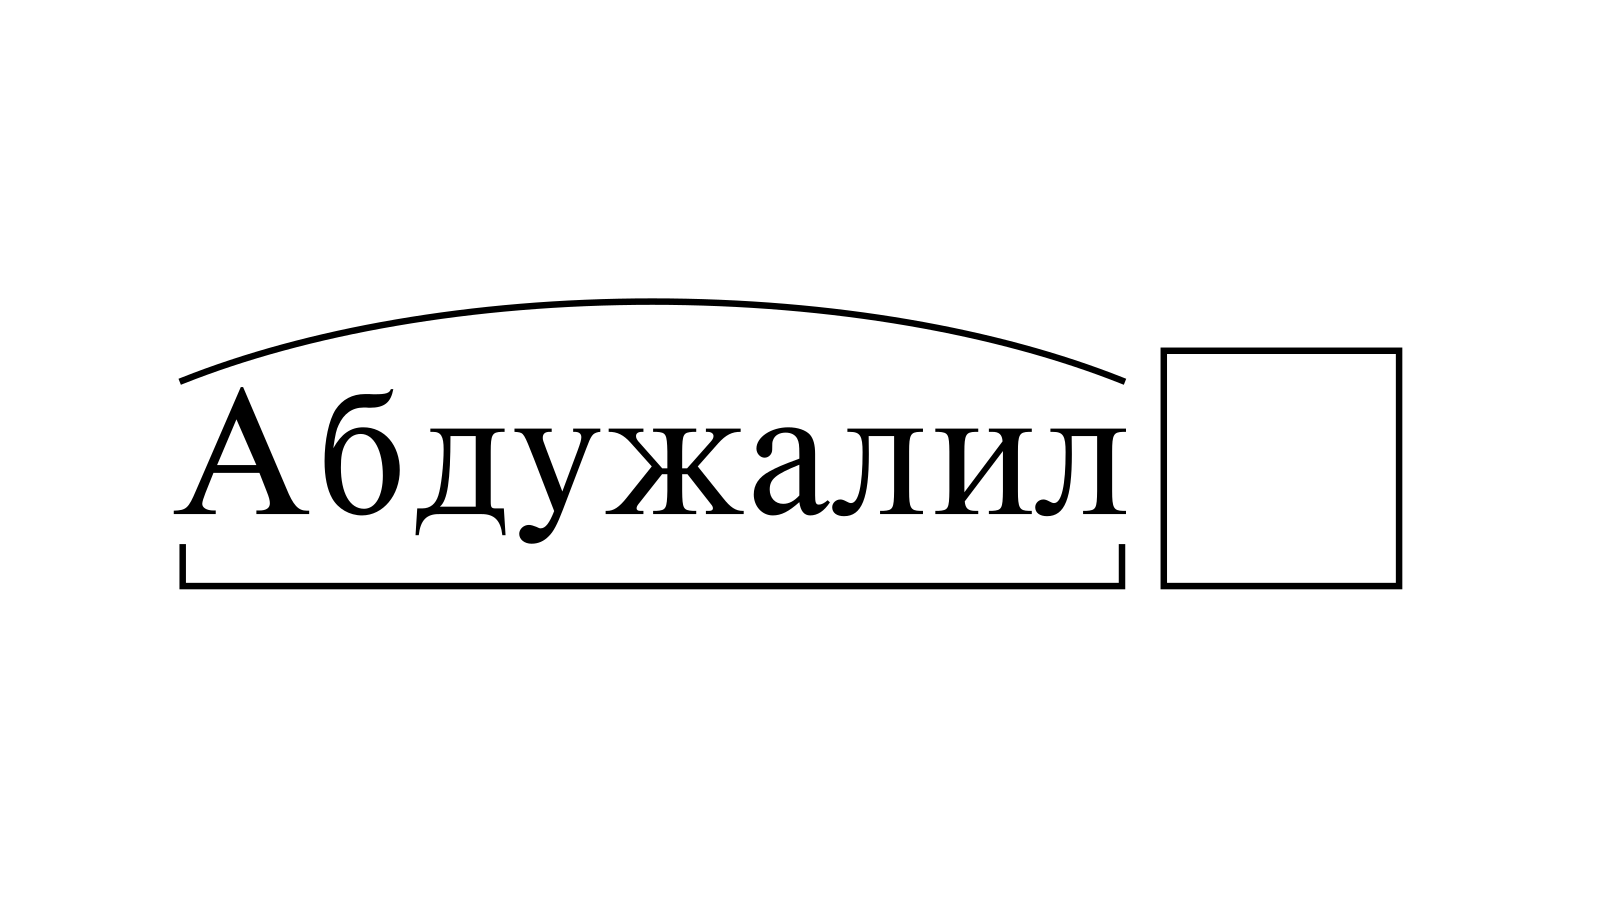 Разбор слова «Абдужалил» по составу